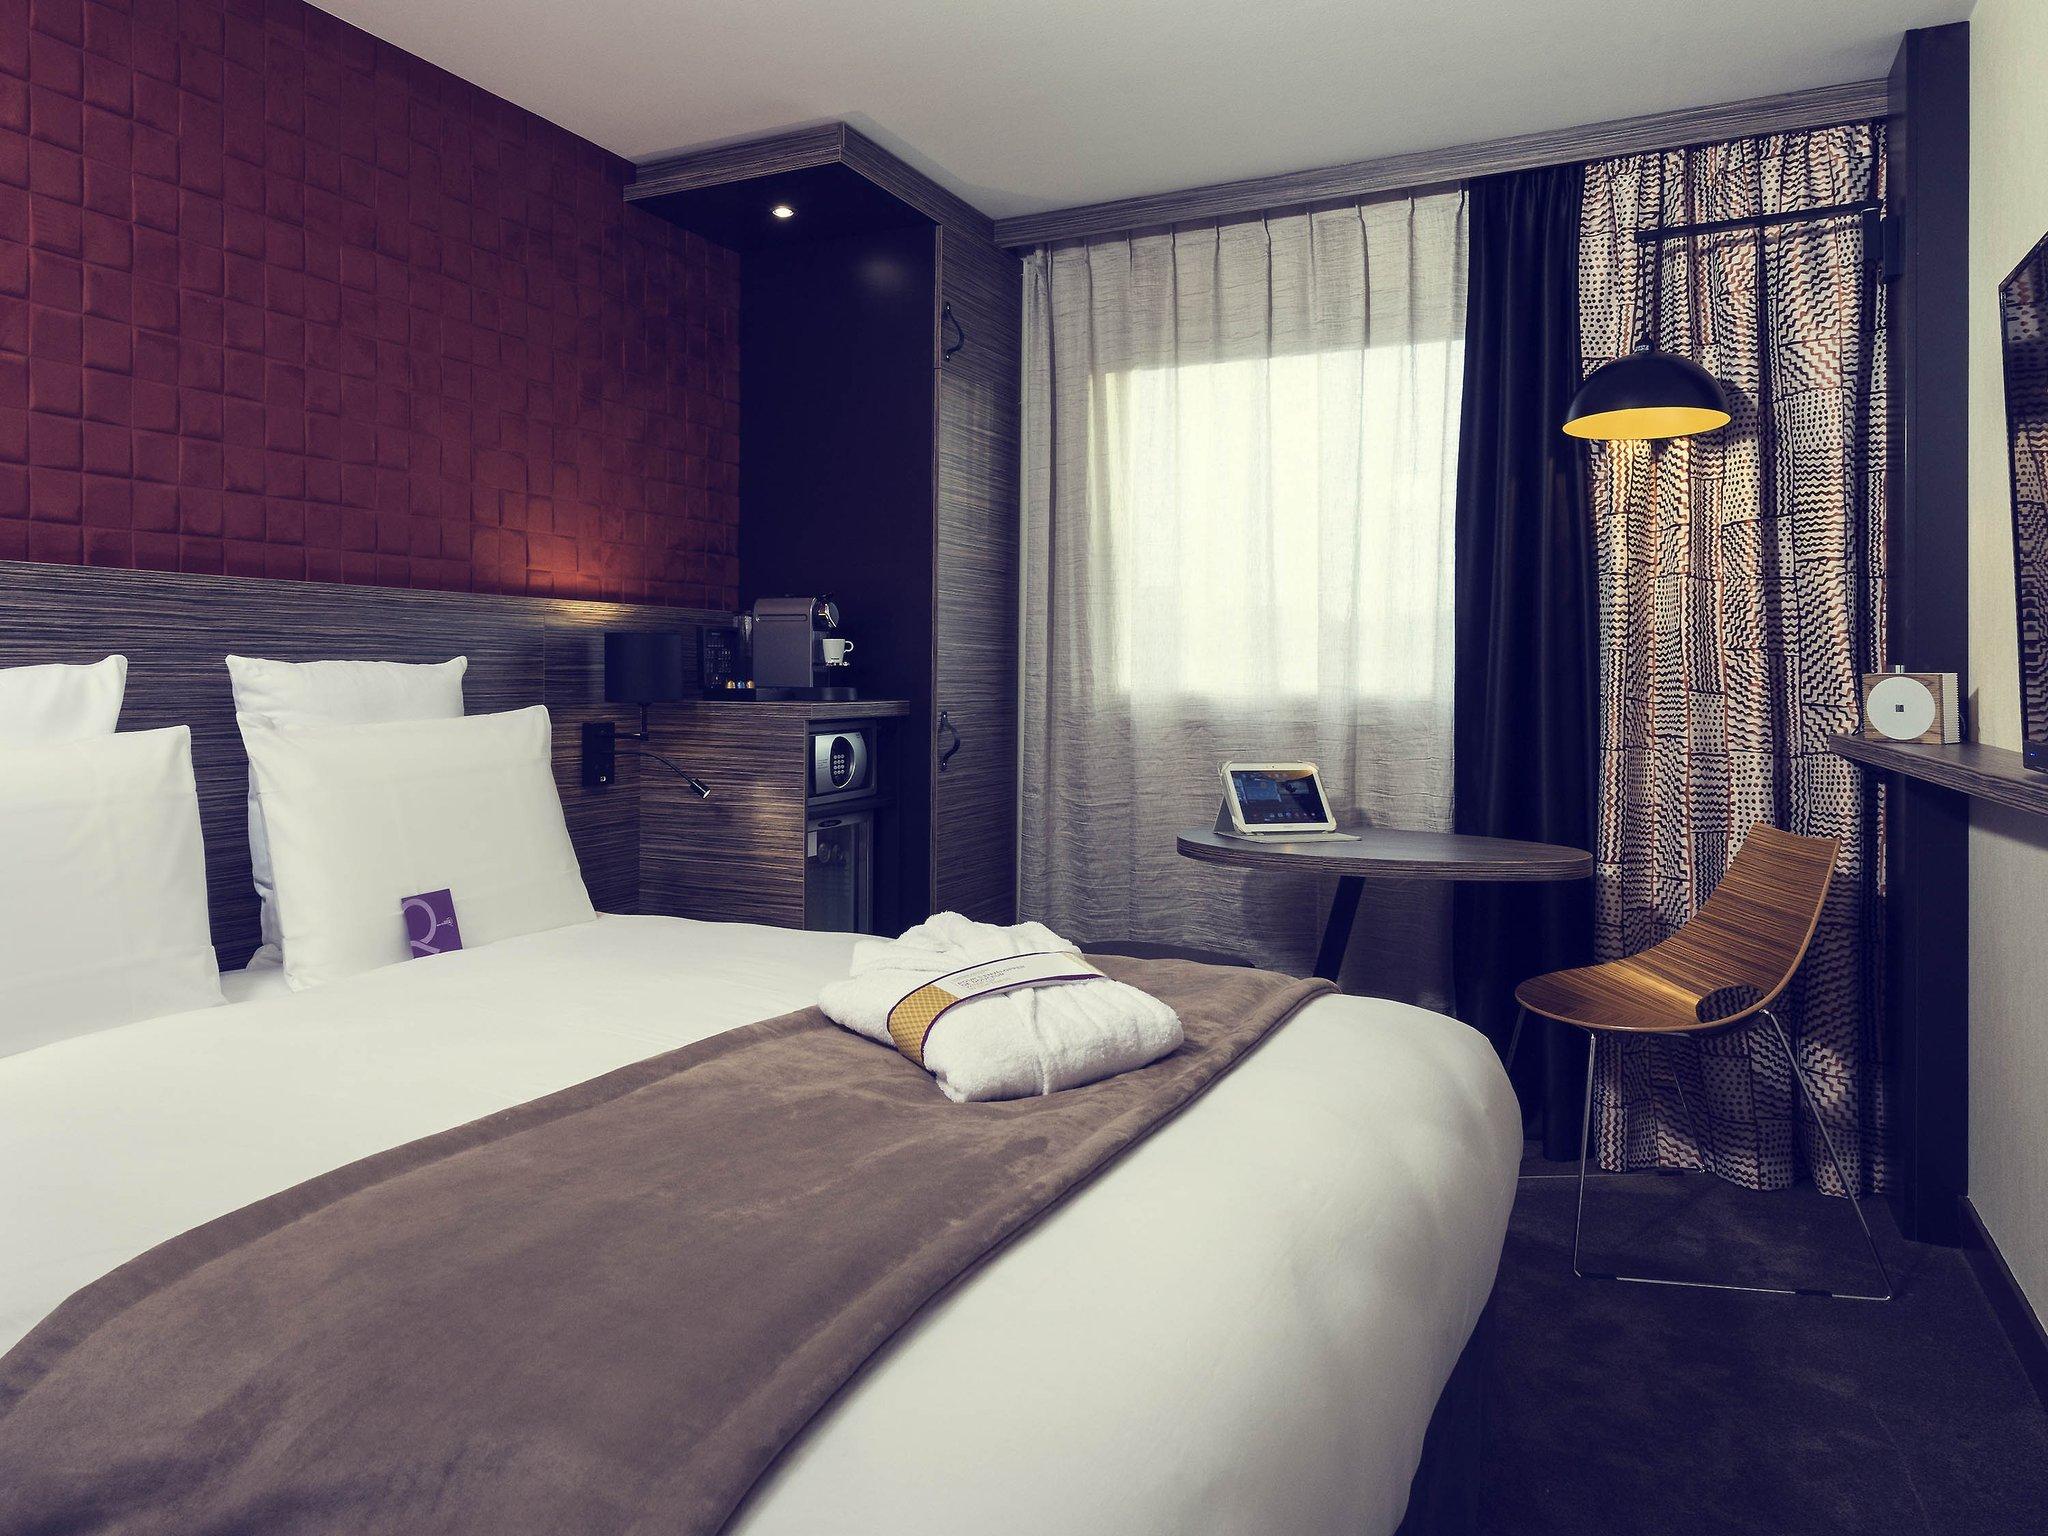 mercure porte de pantin hotel reviews prices photos tripadvisor